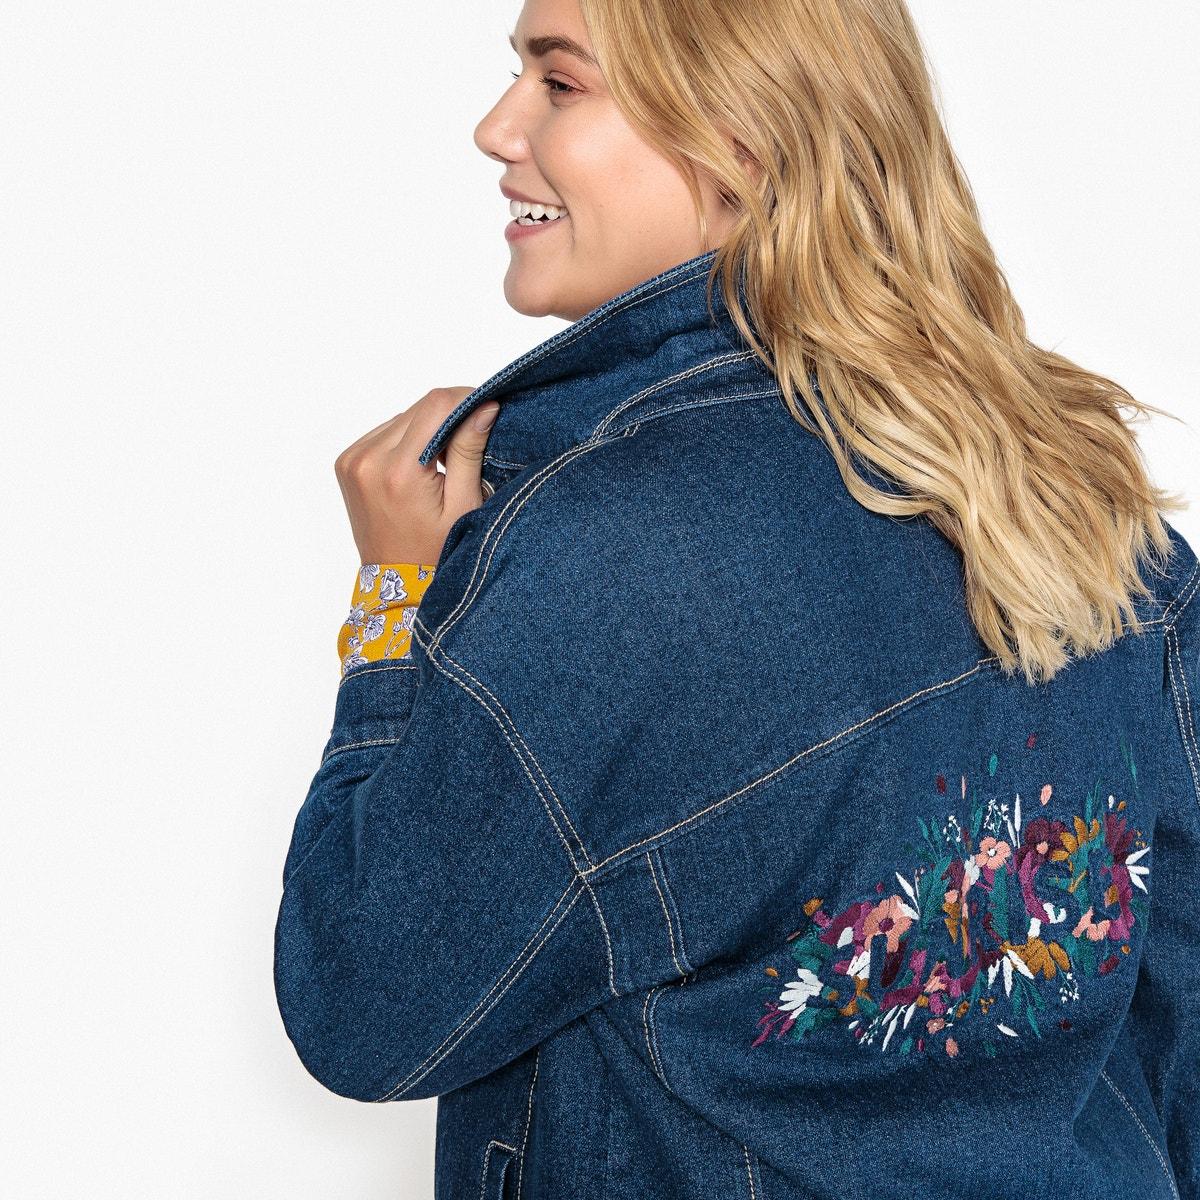 7c0b91a770b15 Castaluna Womens Longline Floral Embroidered Back Denim Jacket